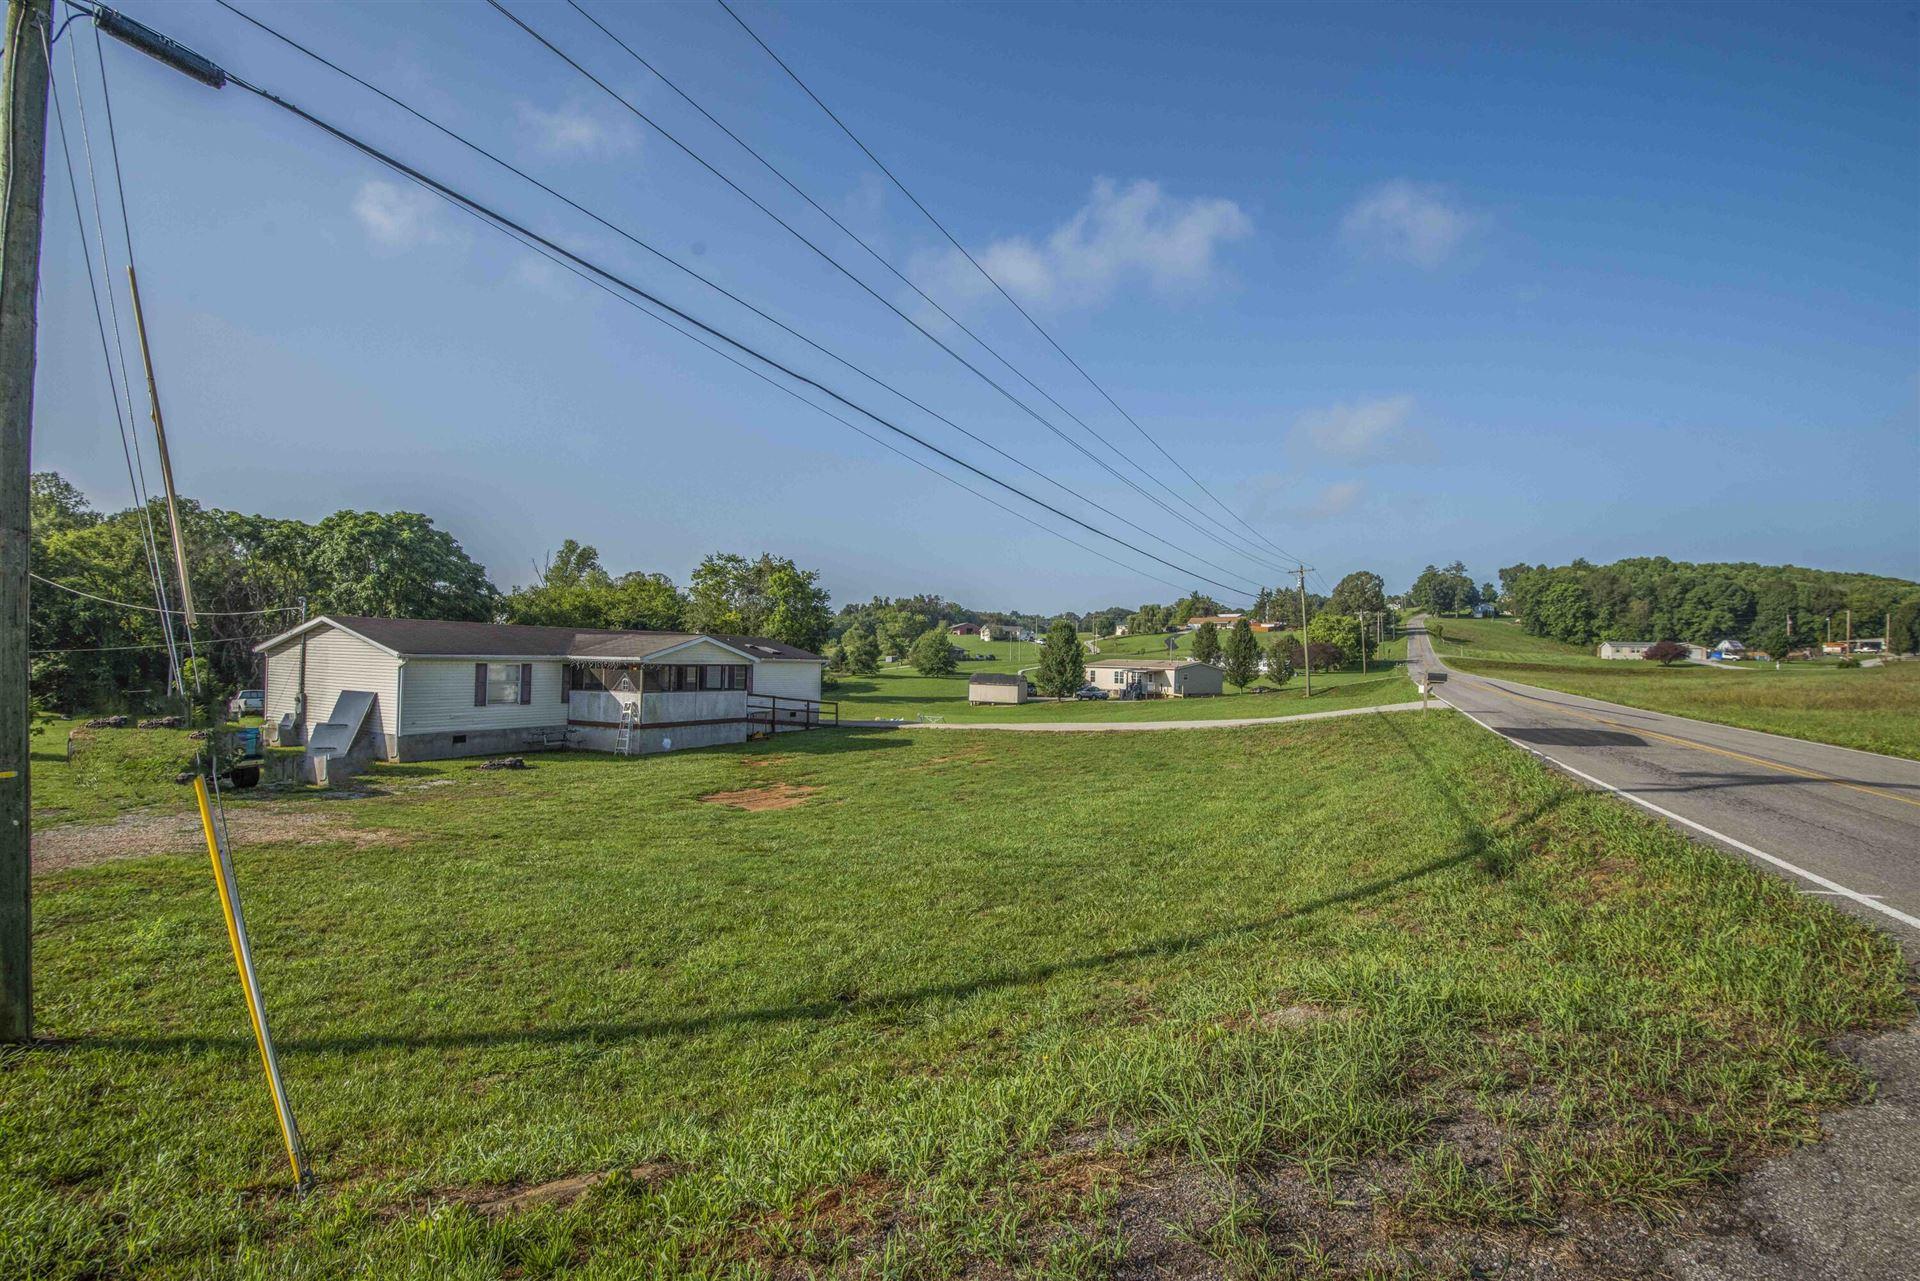 Photo of 5836 Indian Ridge Rd. Rd, Rutledge, TN 37861 (MLS # 1167223)